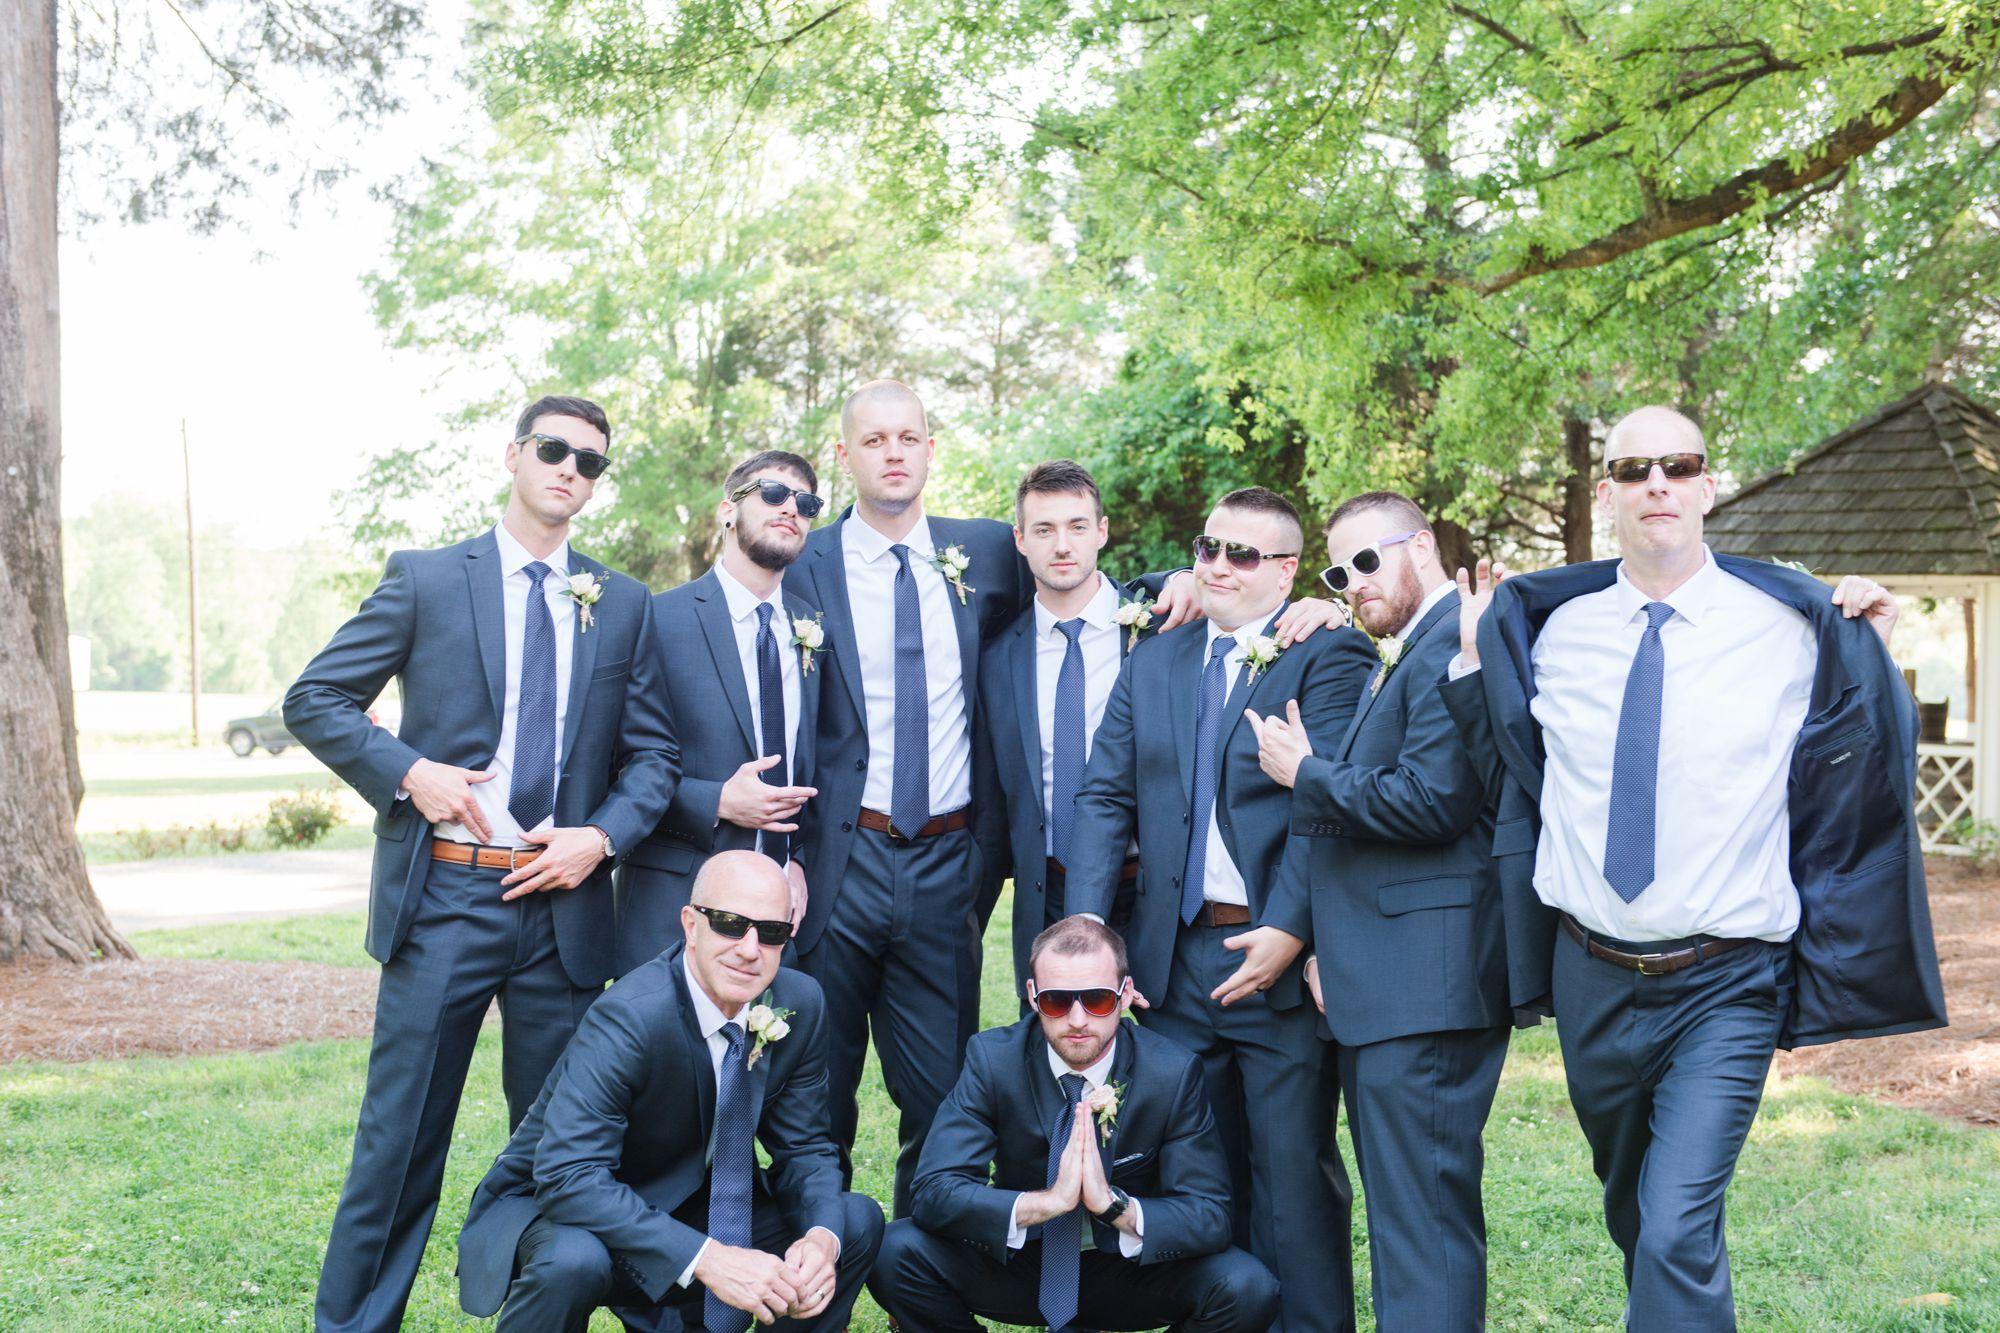 beaver-dam-house-davidson-nc-wedding-photos 36